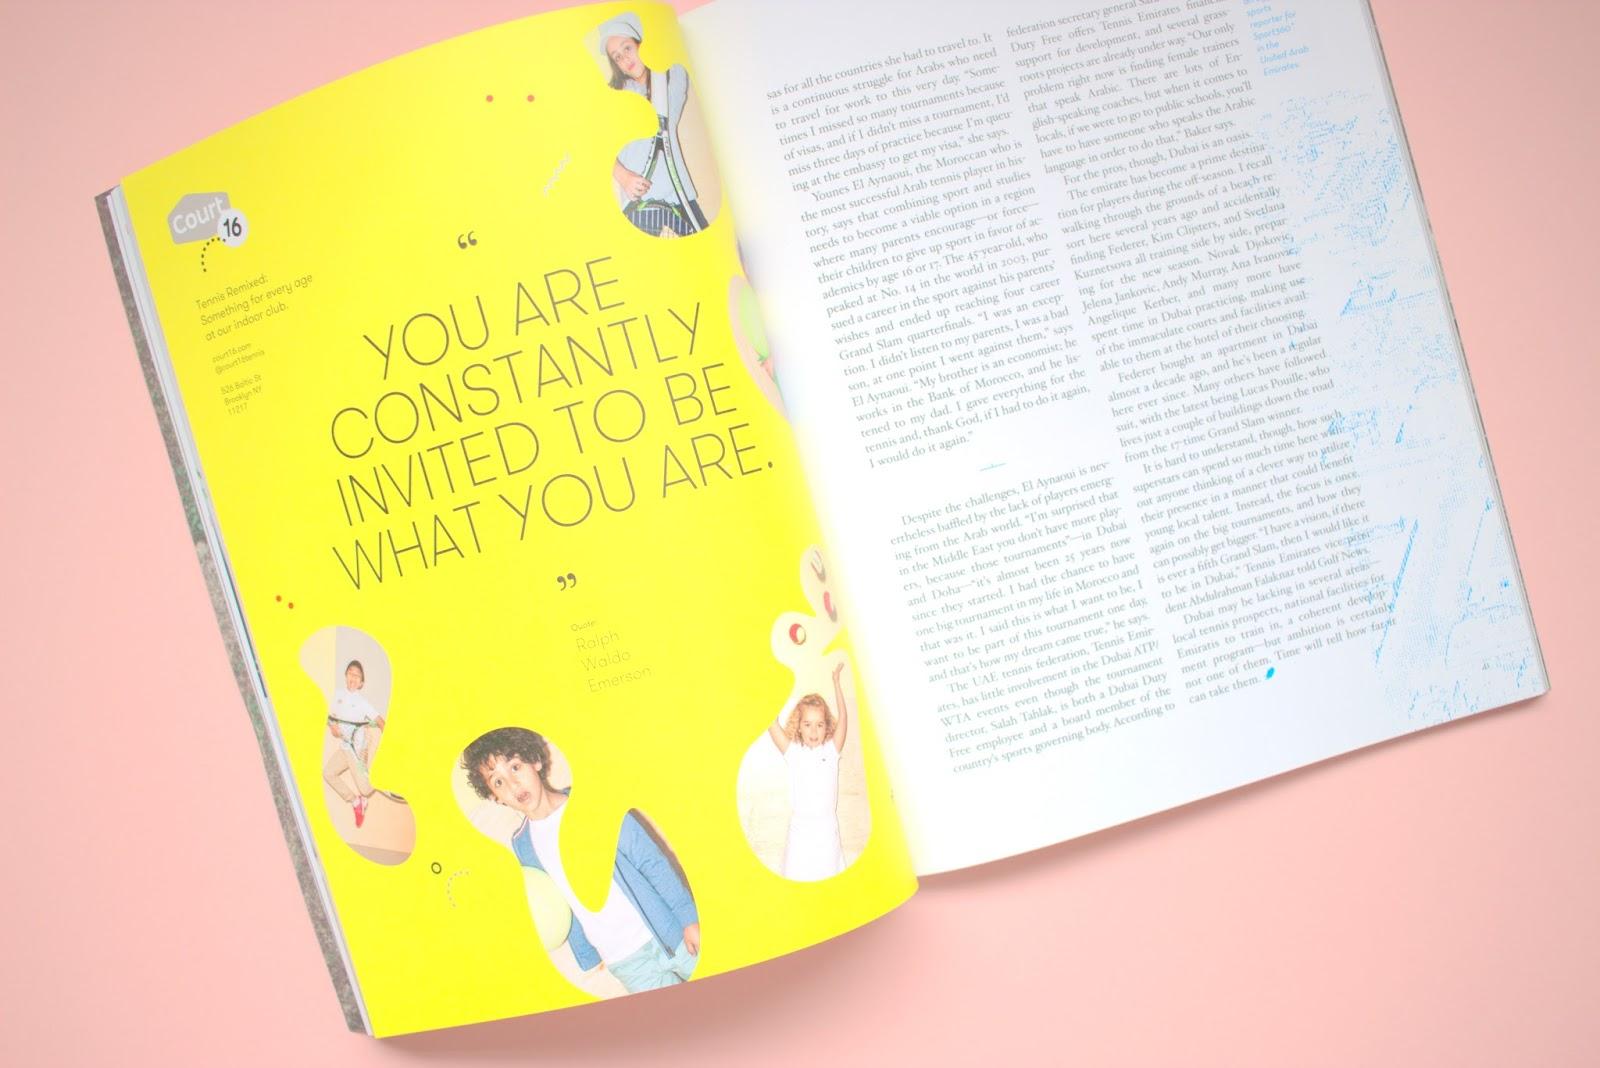 racquet magazine review, tennis magazine, atp, grandslam, indie magazine